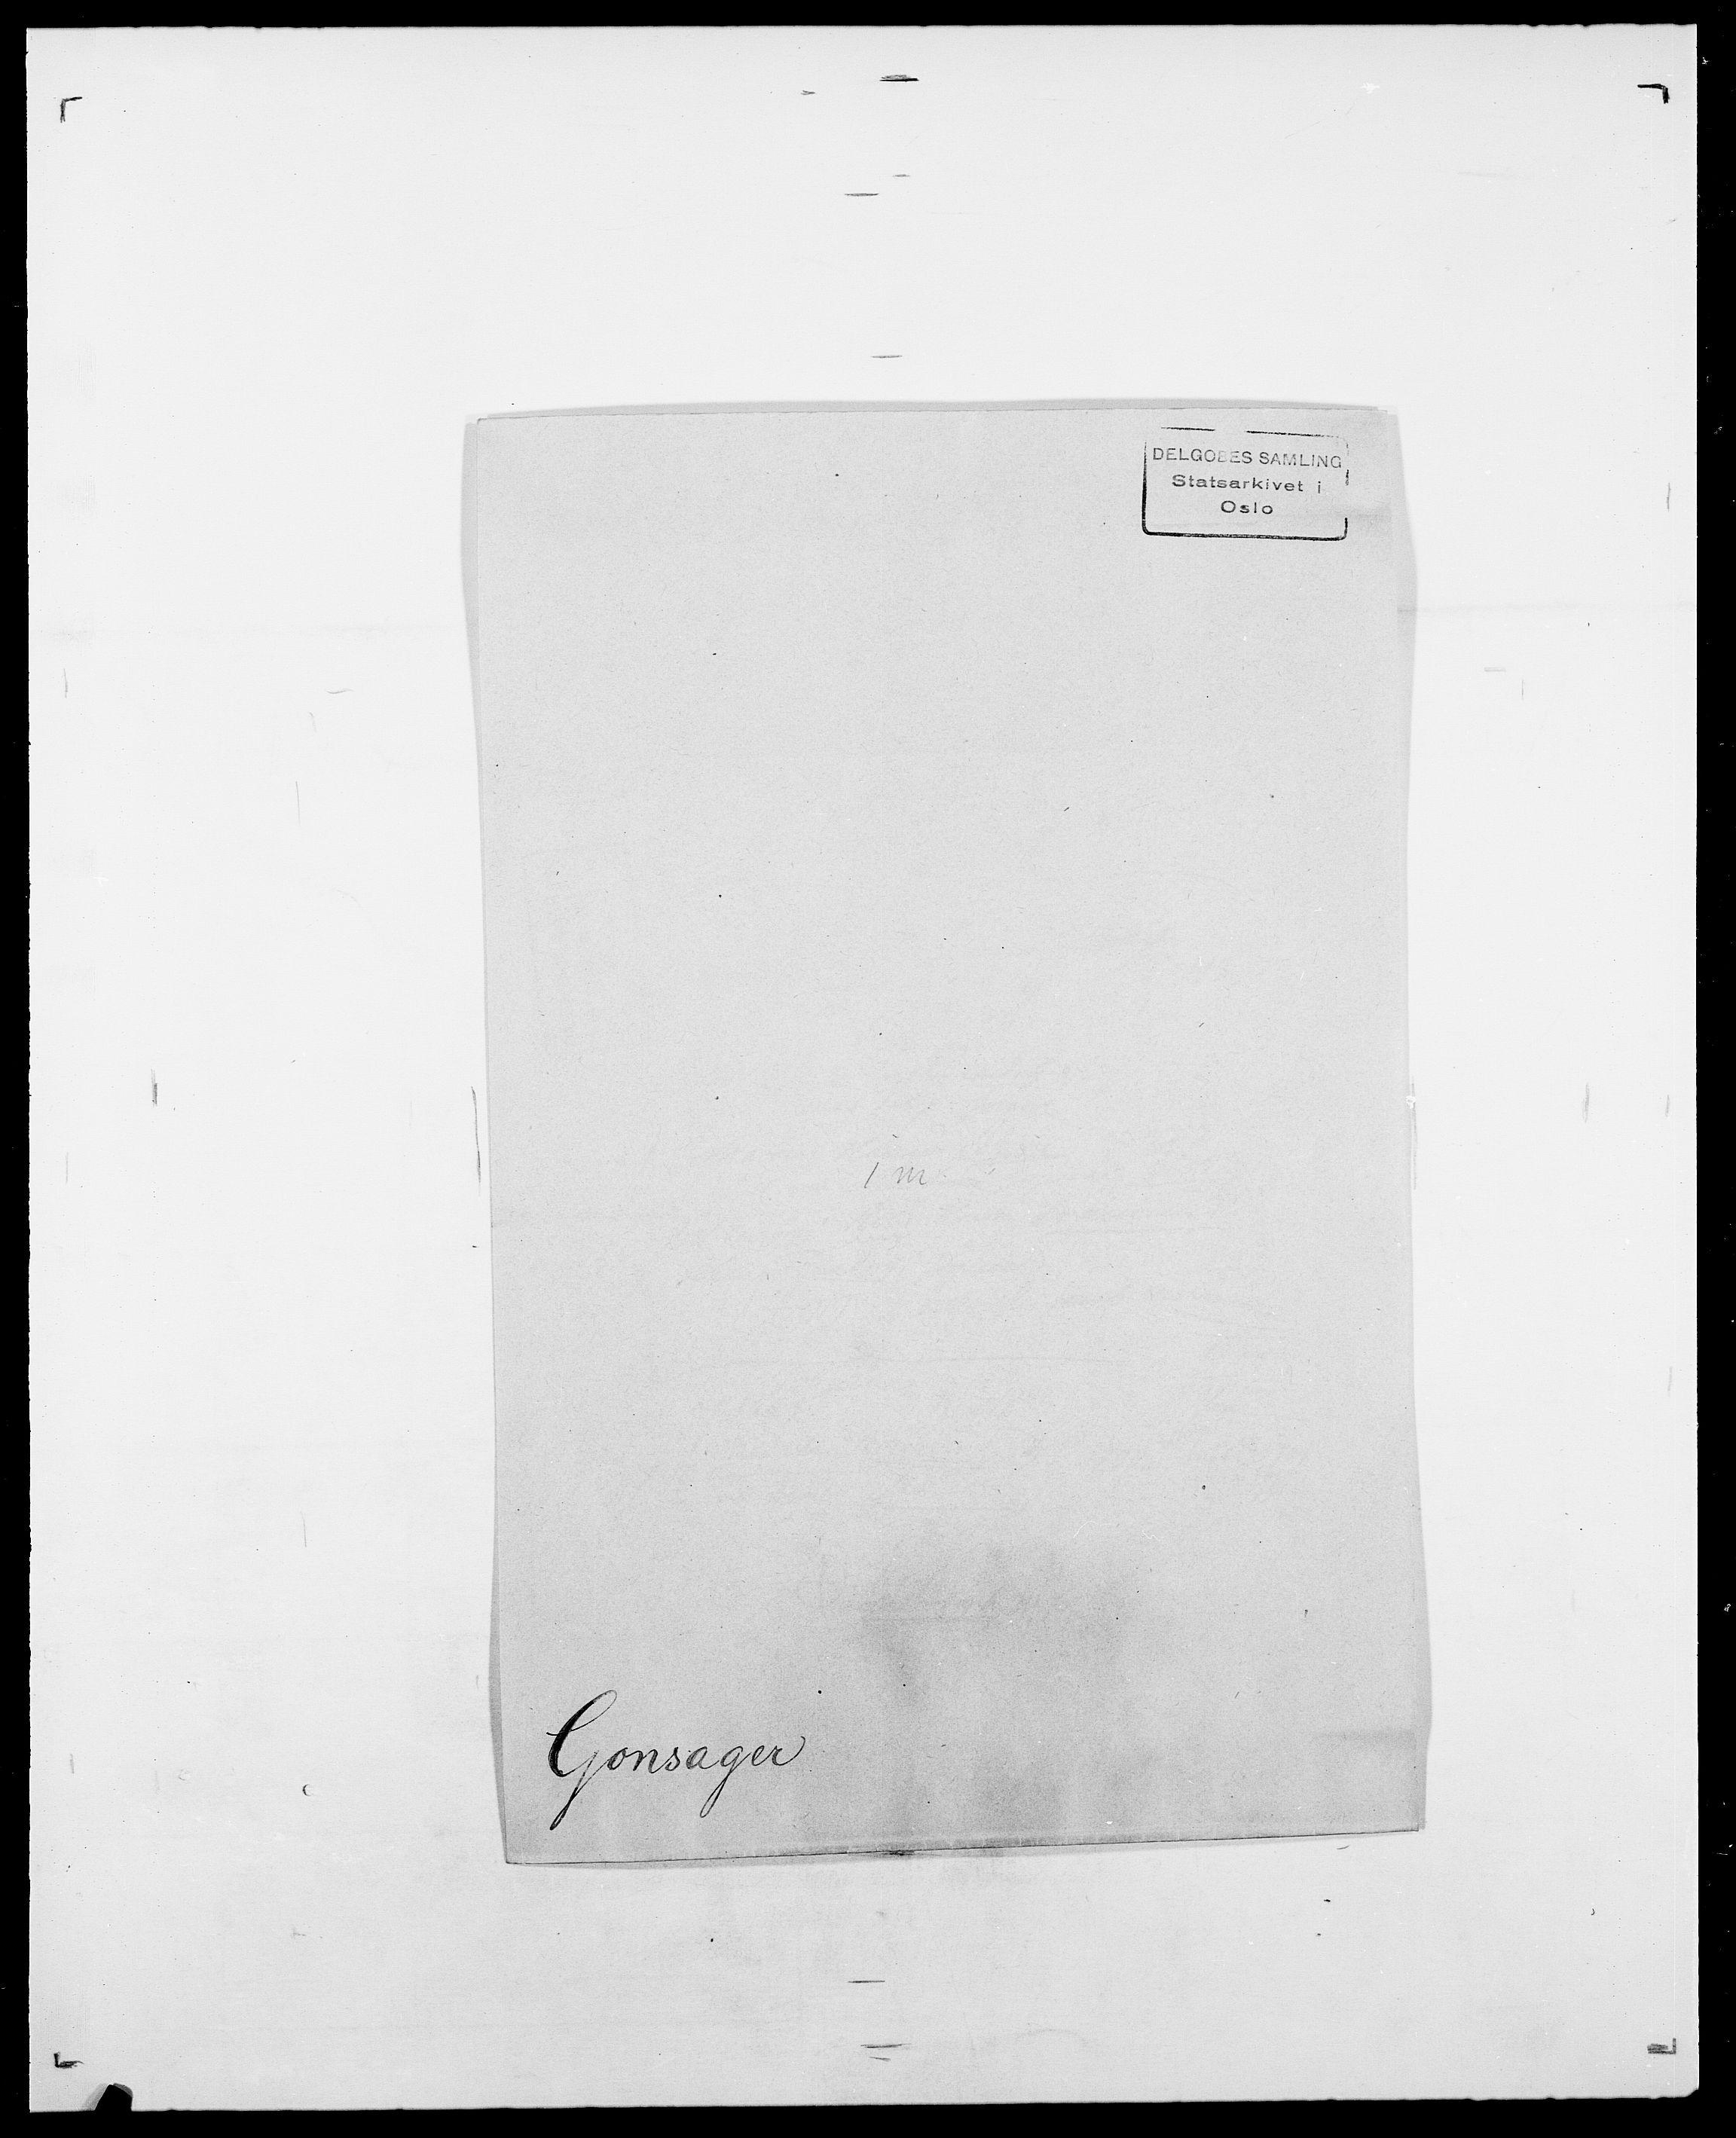 SAO, Delgobe, Charles Antoine - samling, D/Da/L0014: Giebdhausen - Grip, s. 377